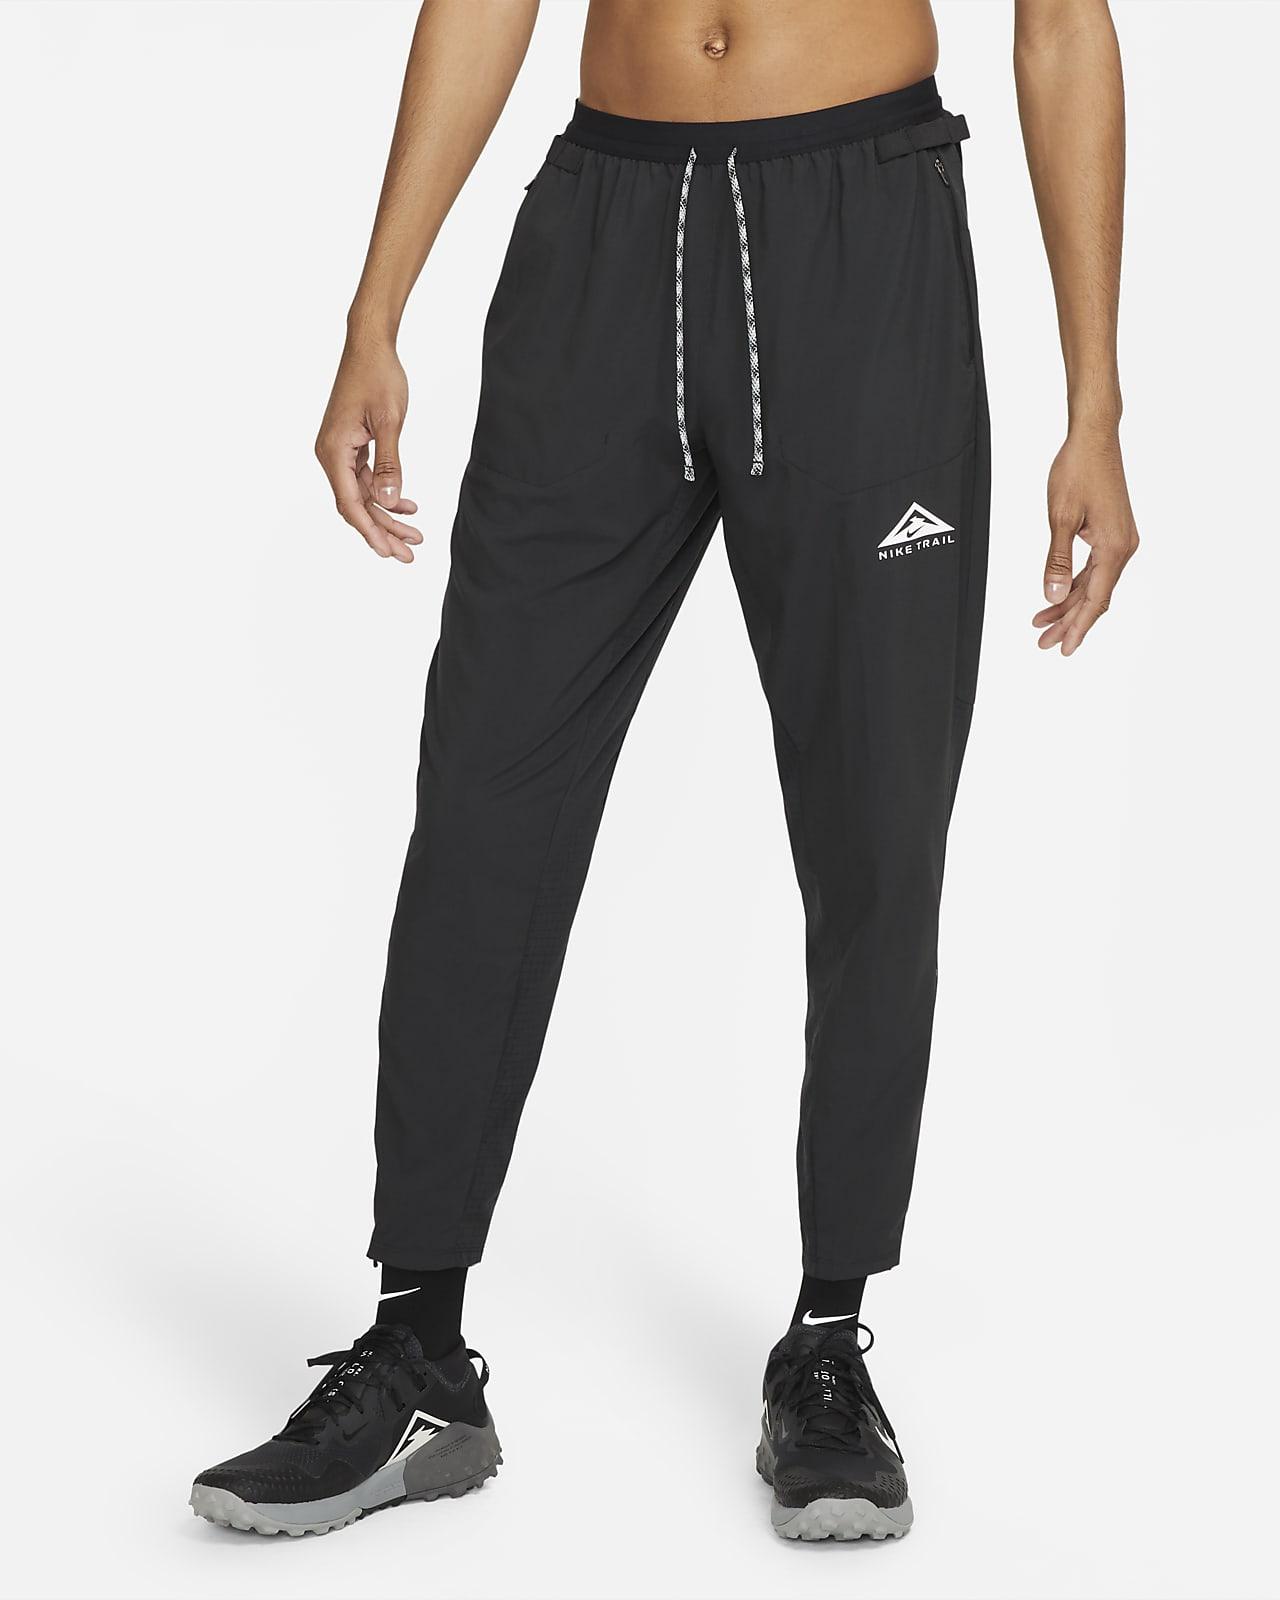 Nike Phenom Elite Pantalón de trail running de tejido Woven - Hombre